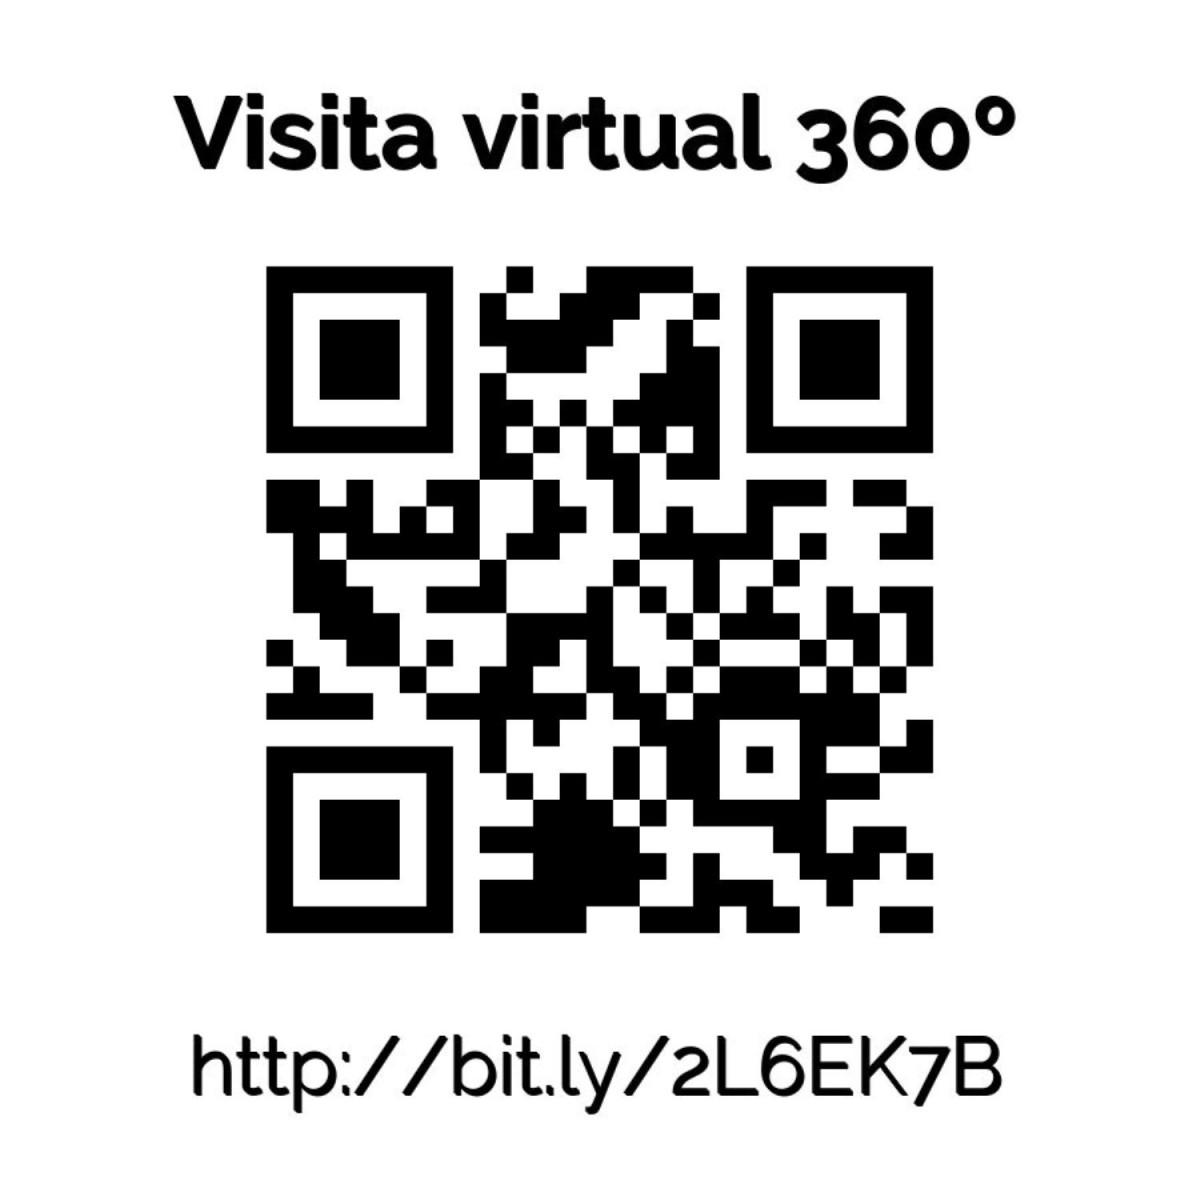 3408-03631